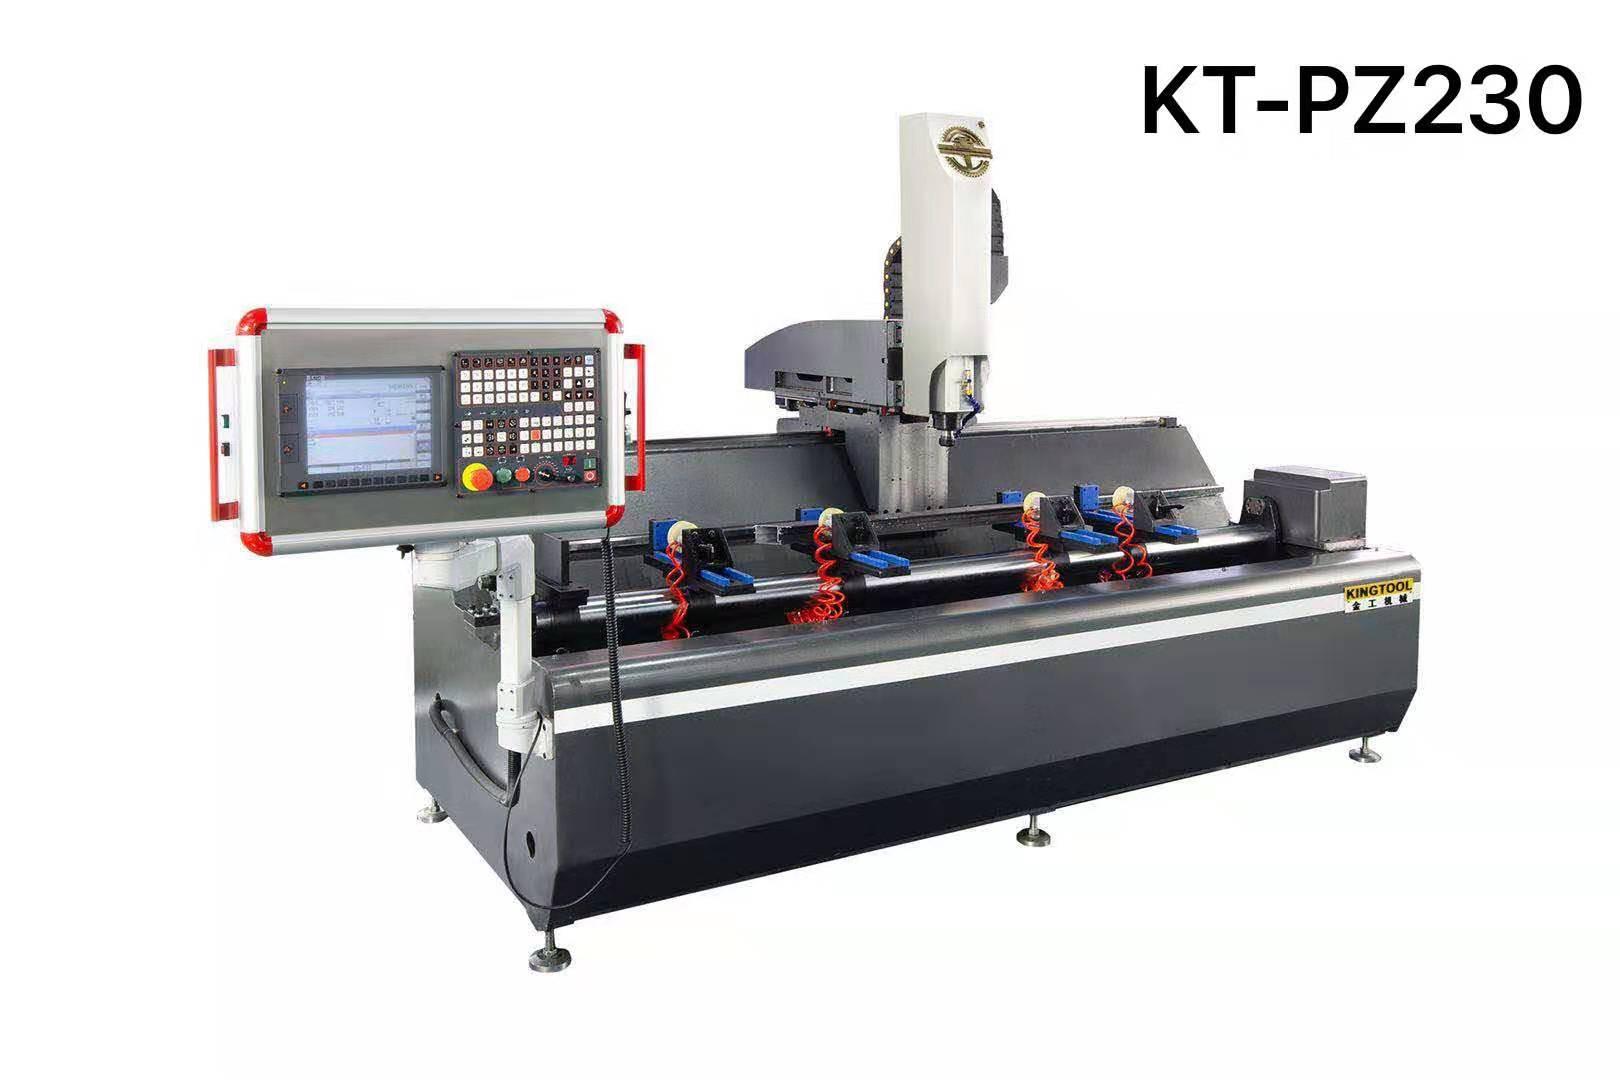 kingtool aluminium machinery inexpensive aluminium cnc router customization for grooving-1